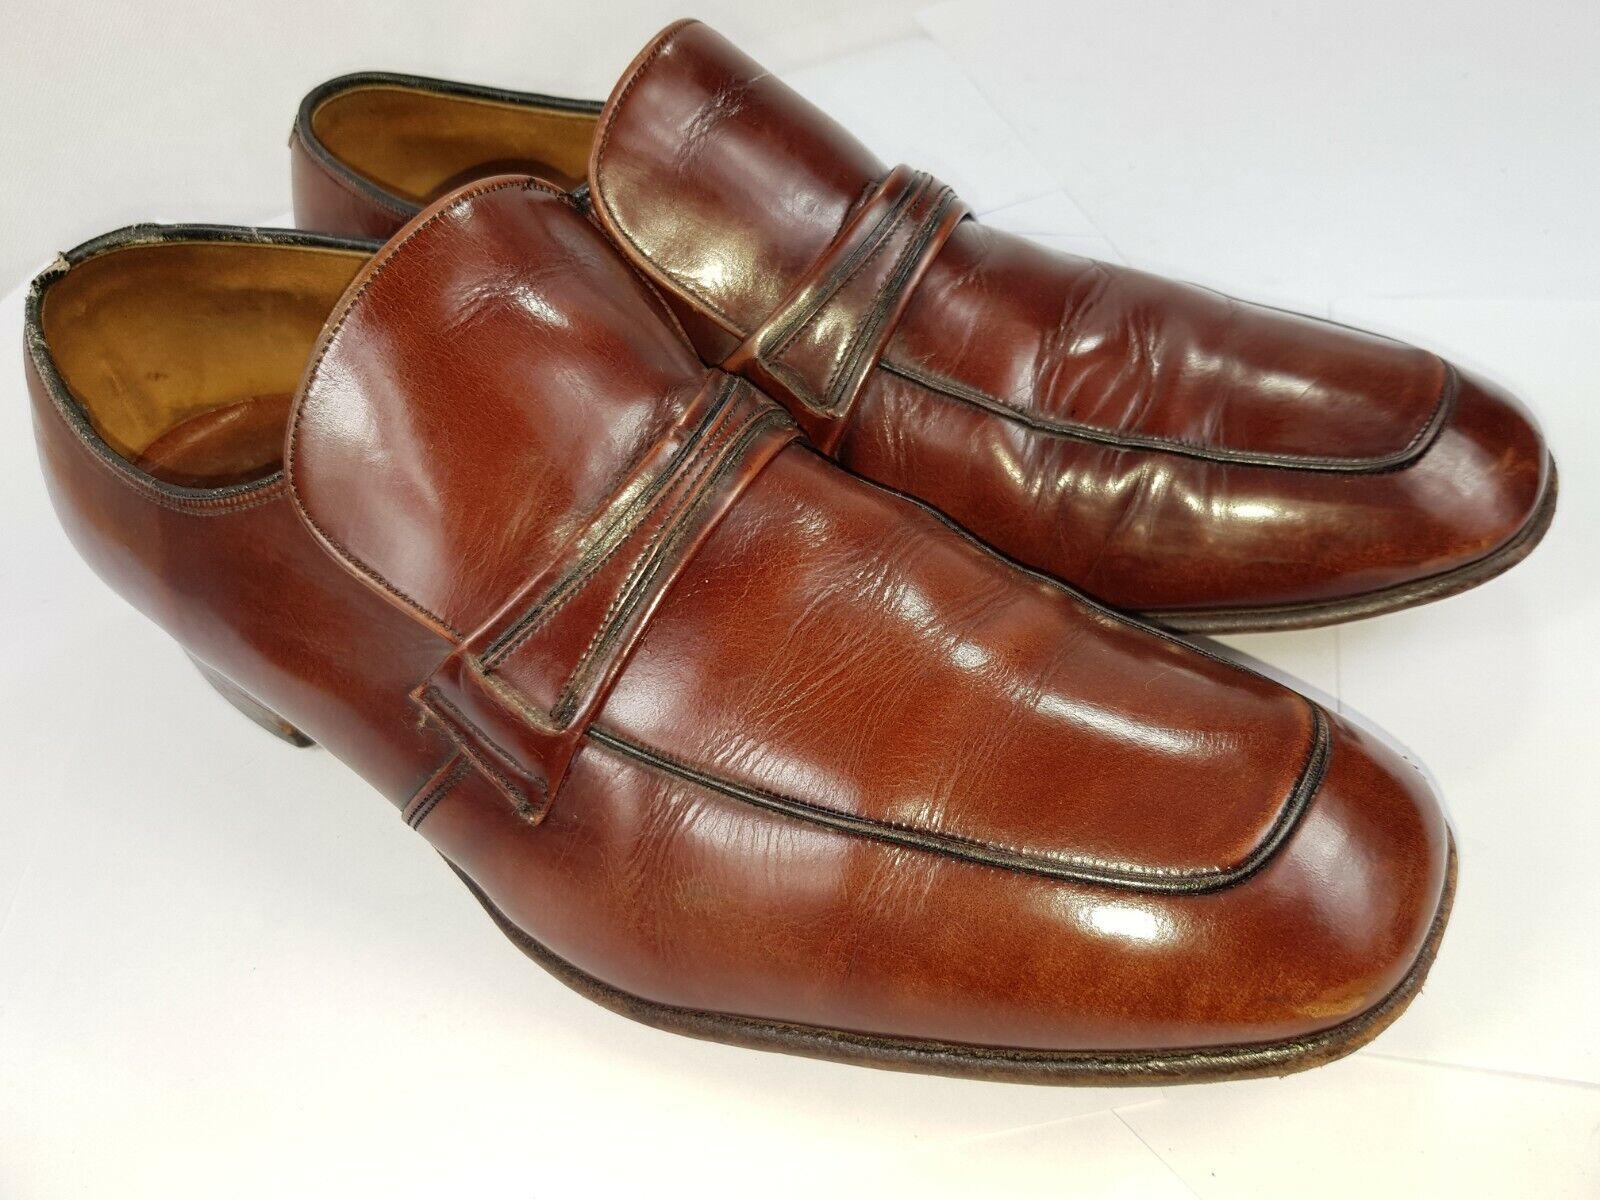 BARKER NOVAS Hand Lasted Genuine Leather Mens Brown Slip On Shoes UK 8 Pre-worn